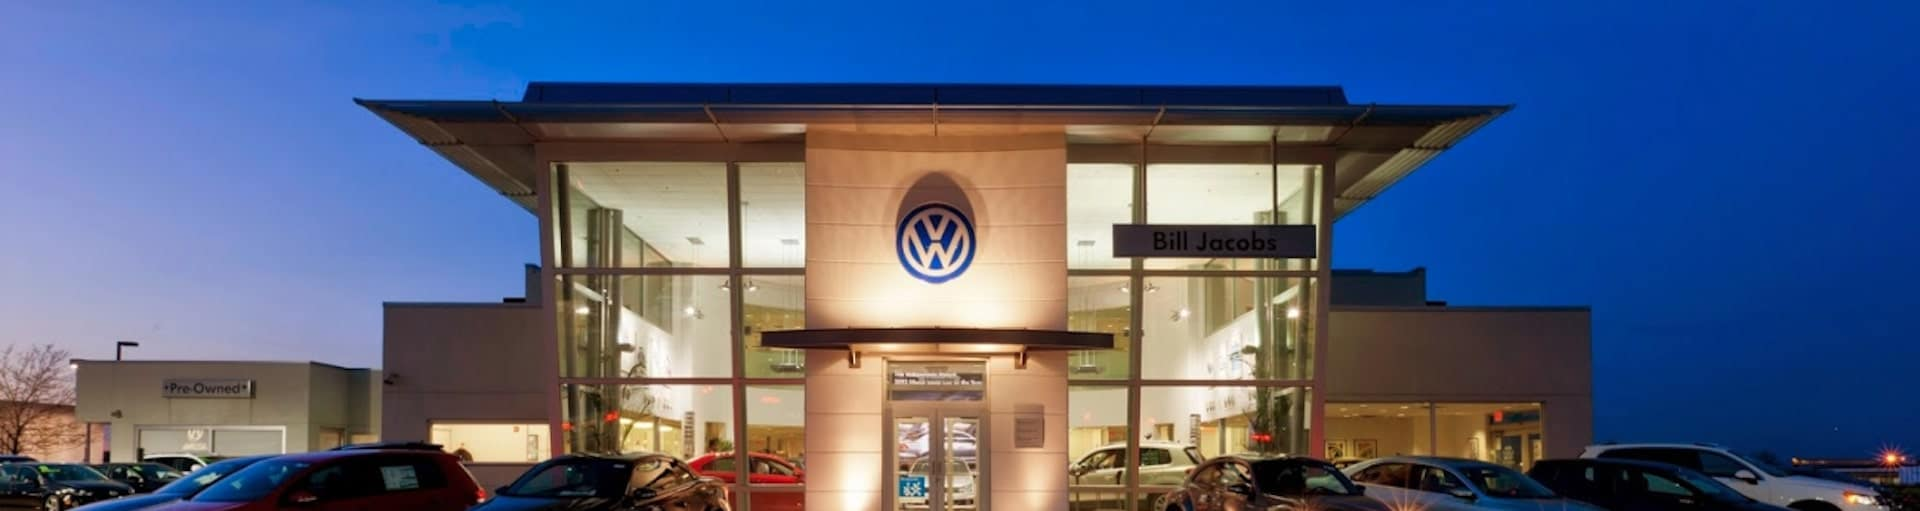 Bill Jacobs VW Dealership